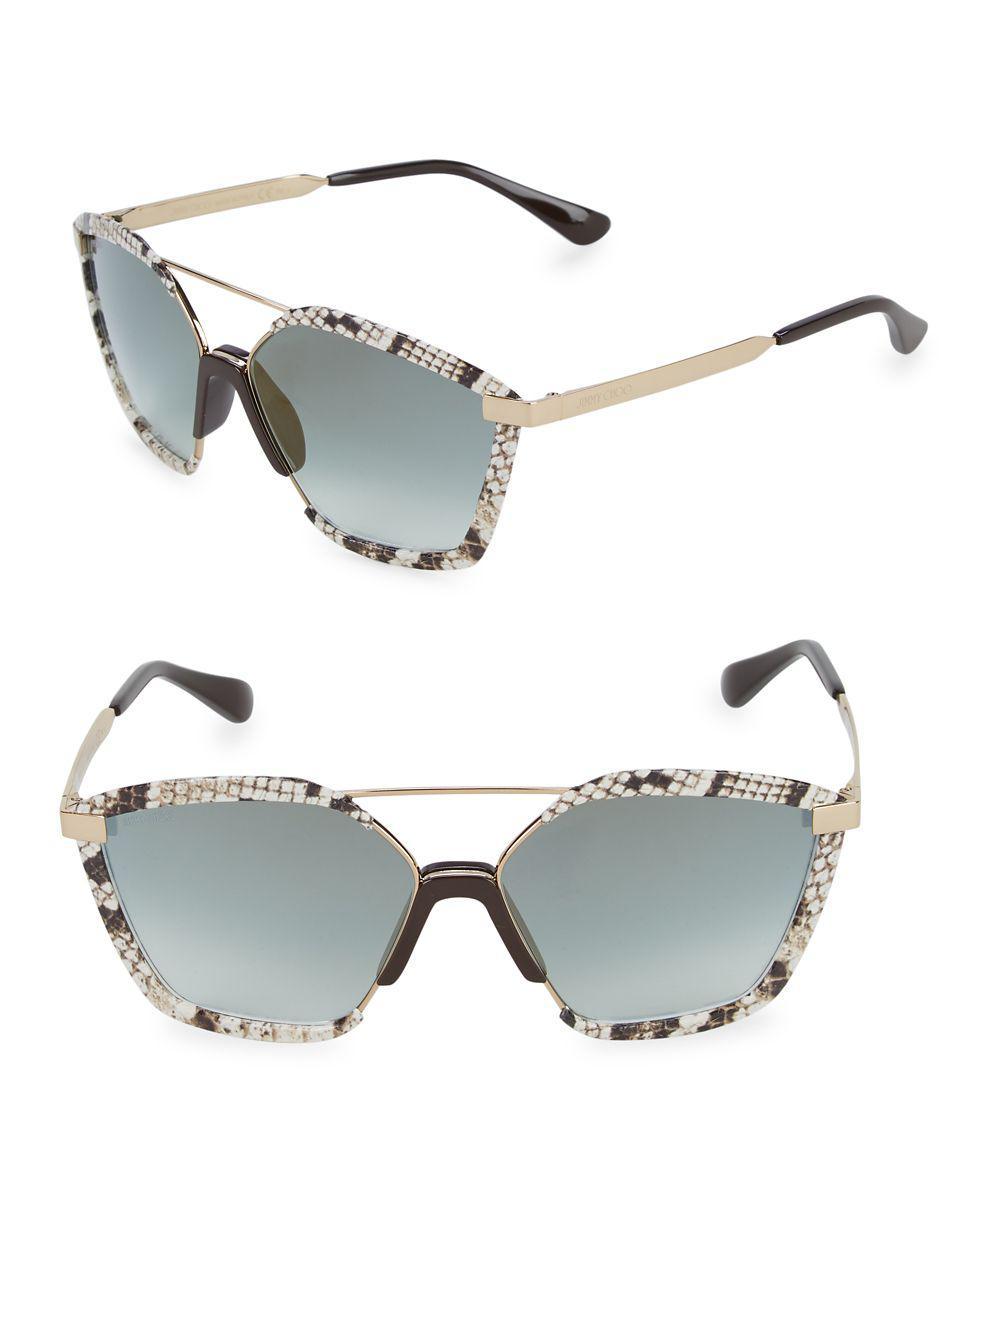 a43a5e6d442 Jimmy Choo. Women s 61mm Aviator Sunglasses